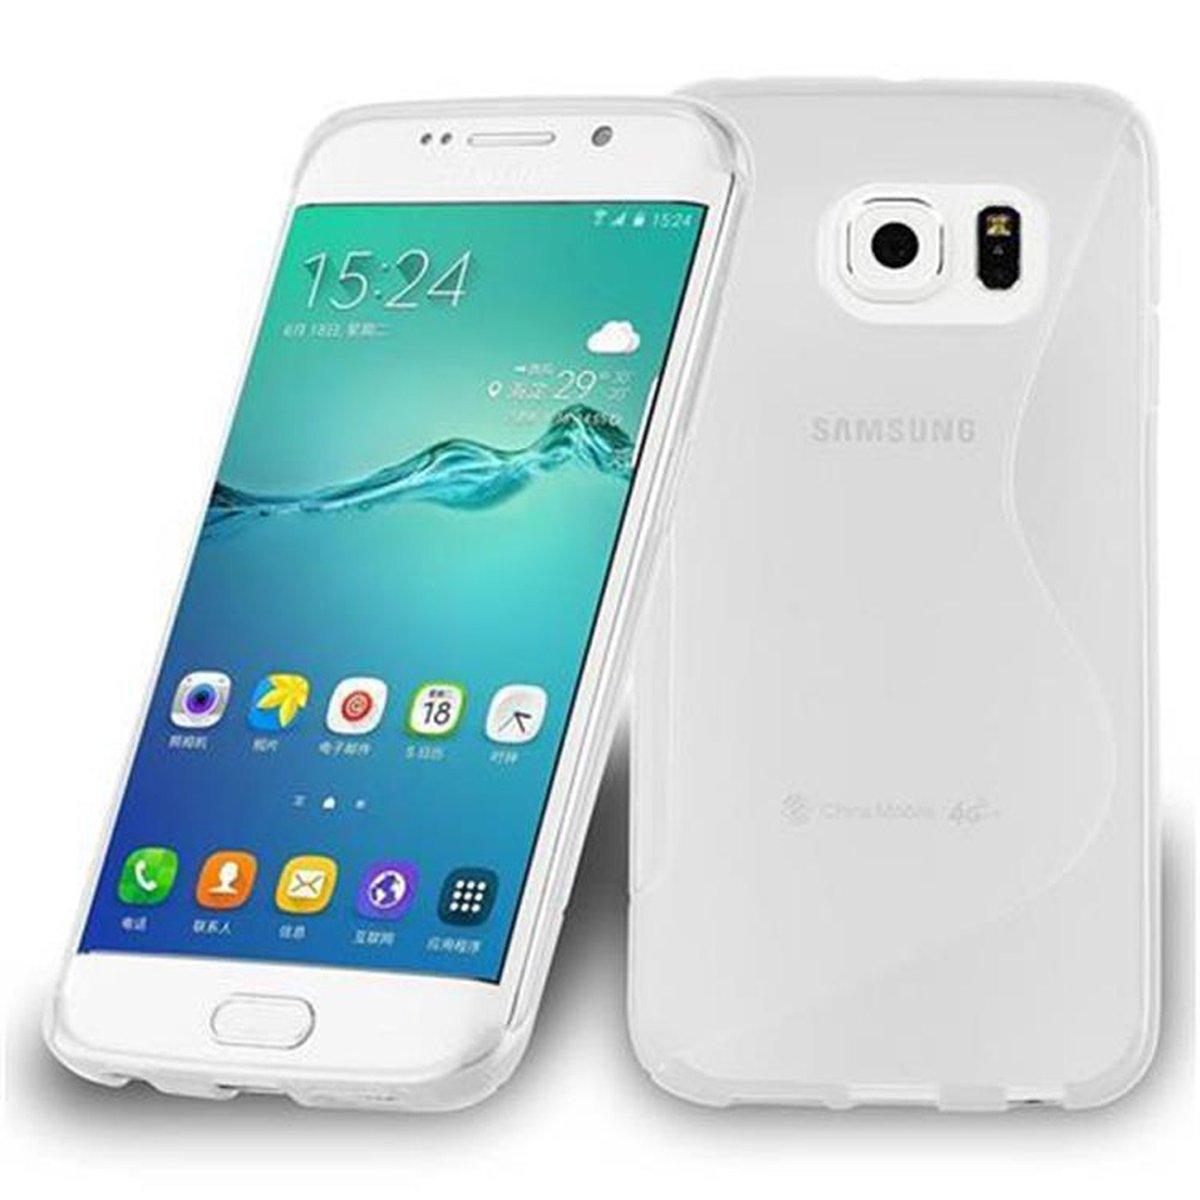 Cadorabo Hulle Fur Samsung Galaxy S6 Edge Plus In Halb Transparent Handyhulle Aus Flexiblem Tpu Silikon Silikonhulle Schutzhulle Ultra Slim Soft Back Cover Case Bumper Kaufen Bei Cadorabo E Commerce